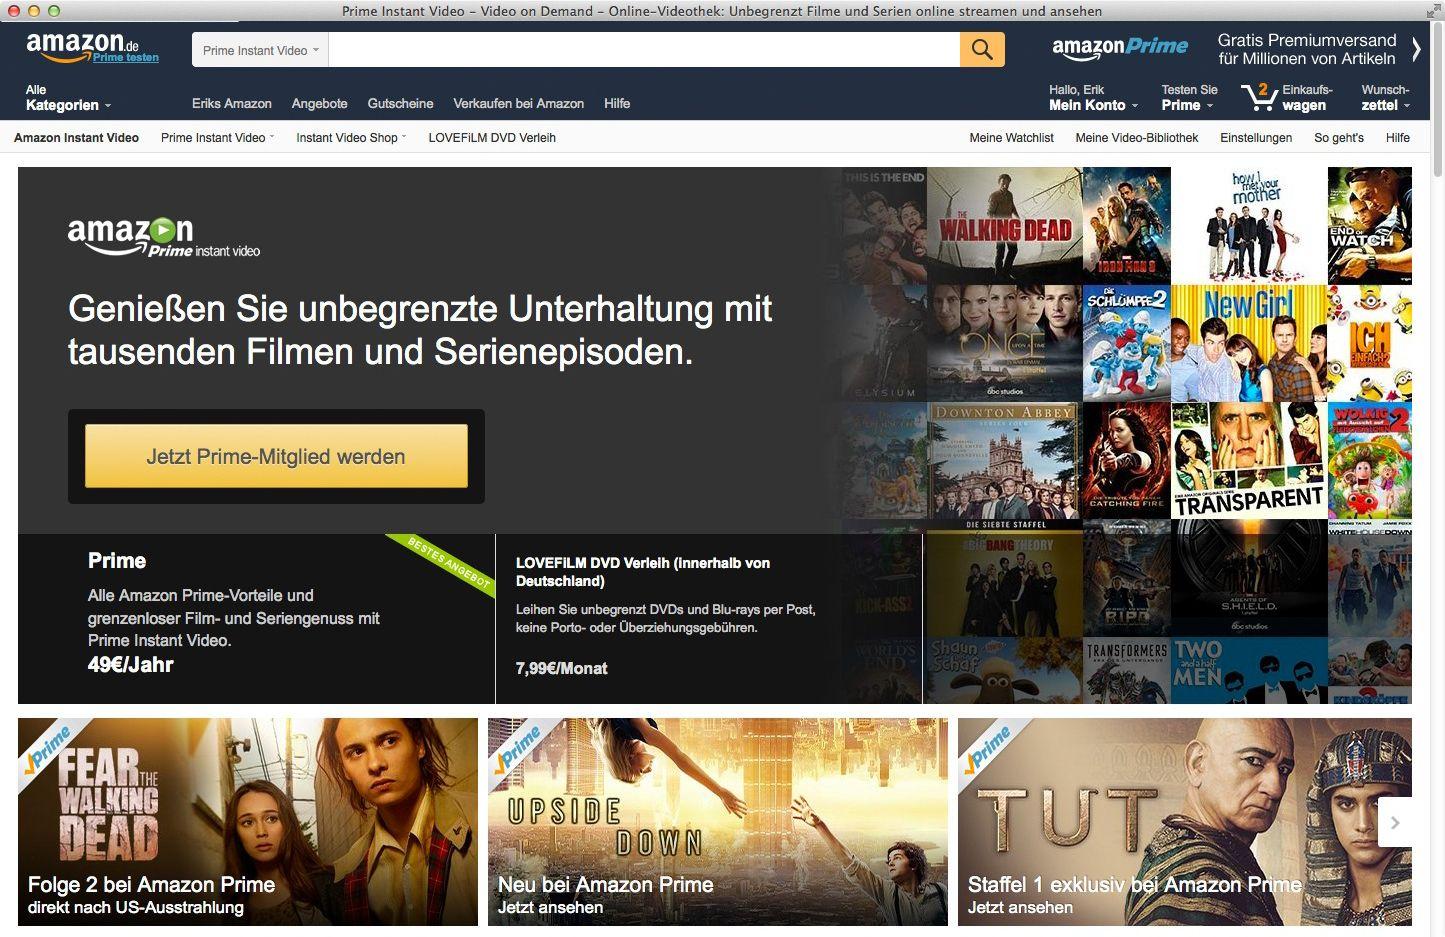 NUR ALS ZITAT Screenshot Amazon Prime Instant Video2